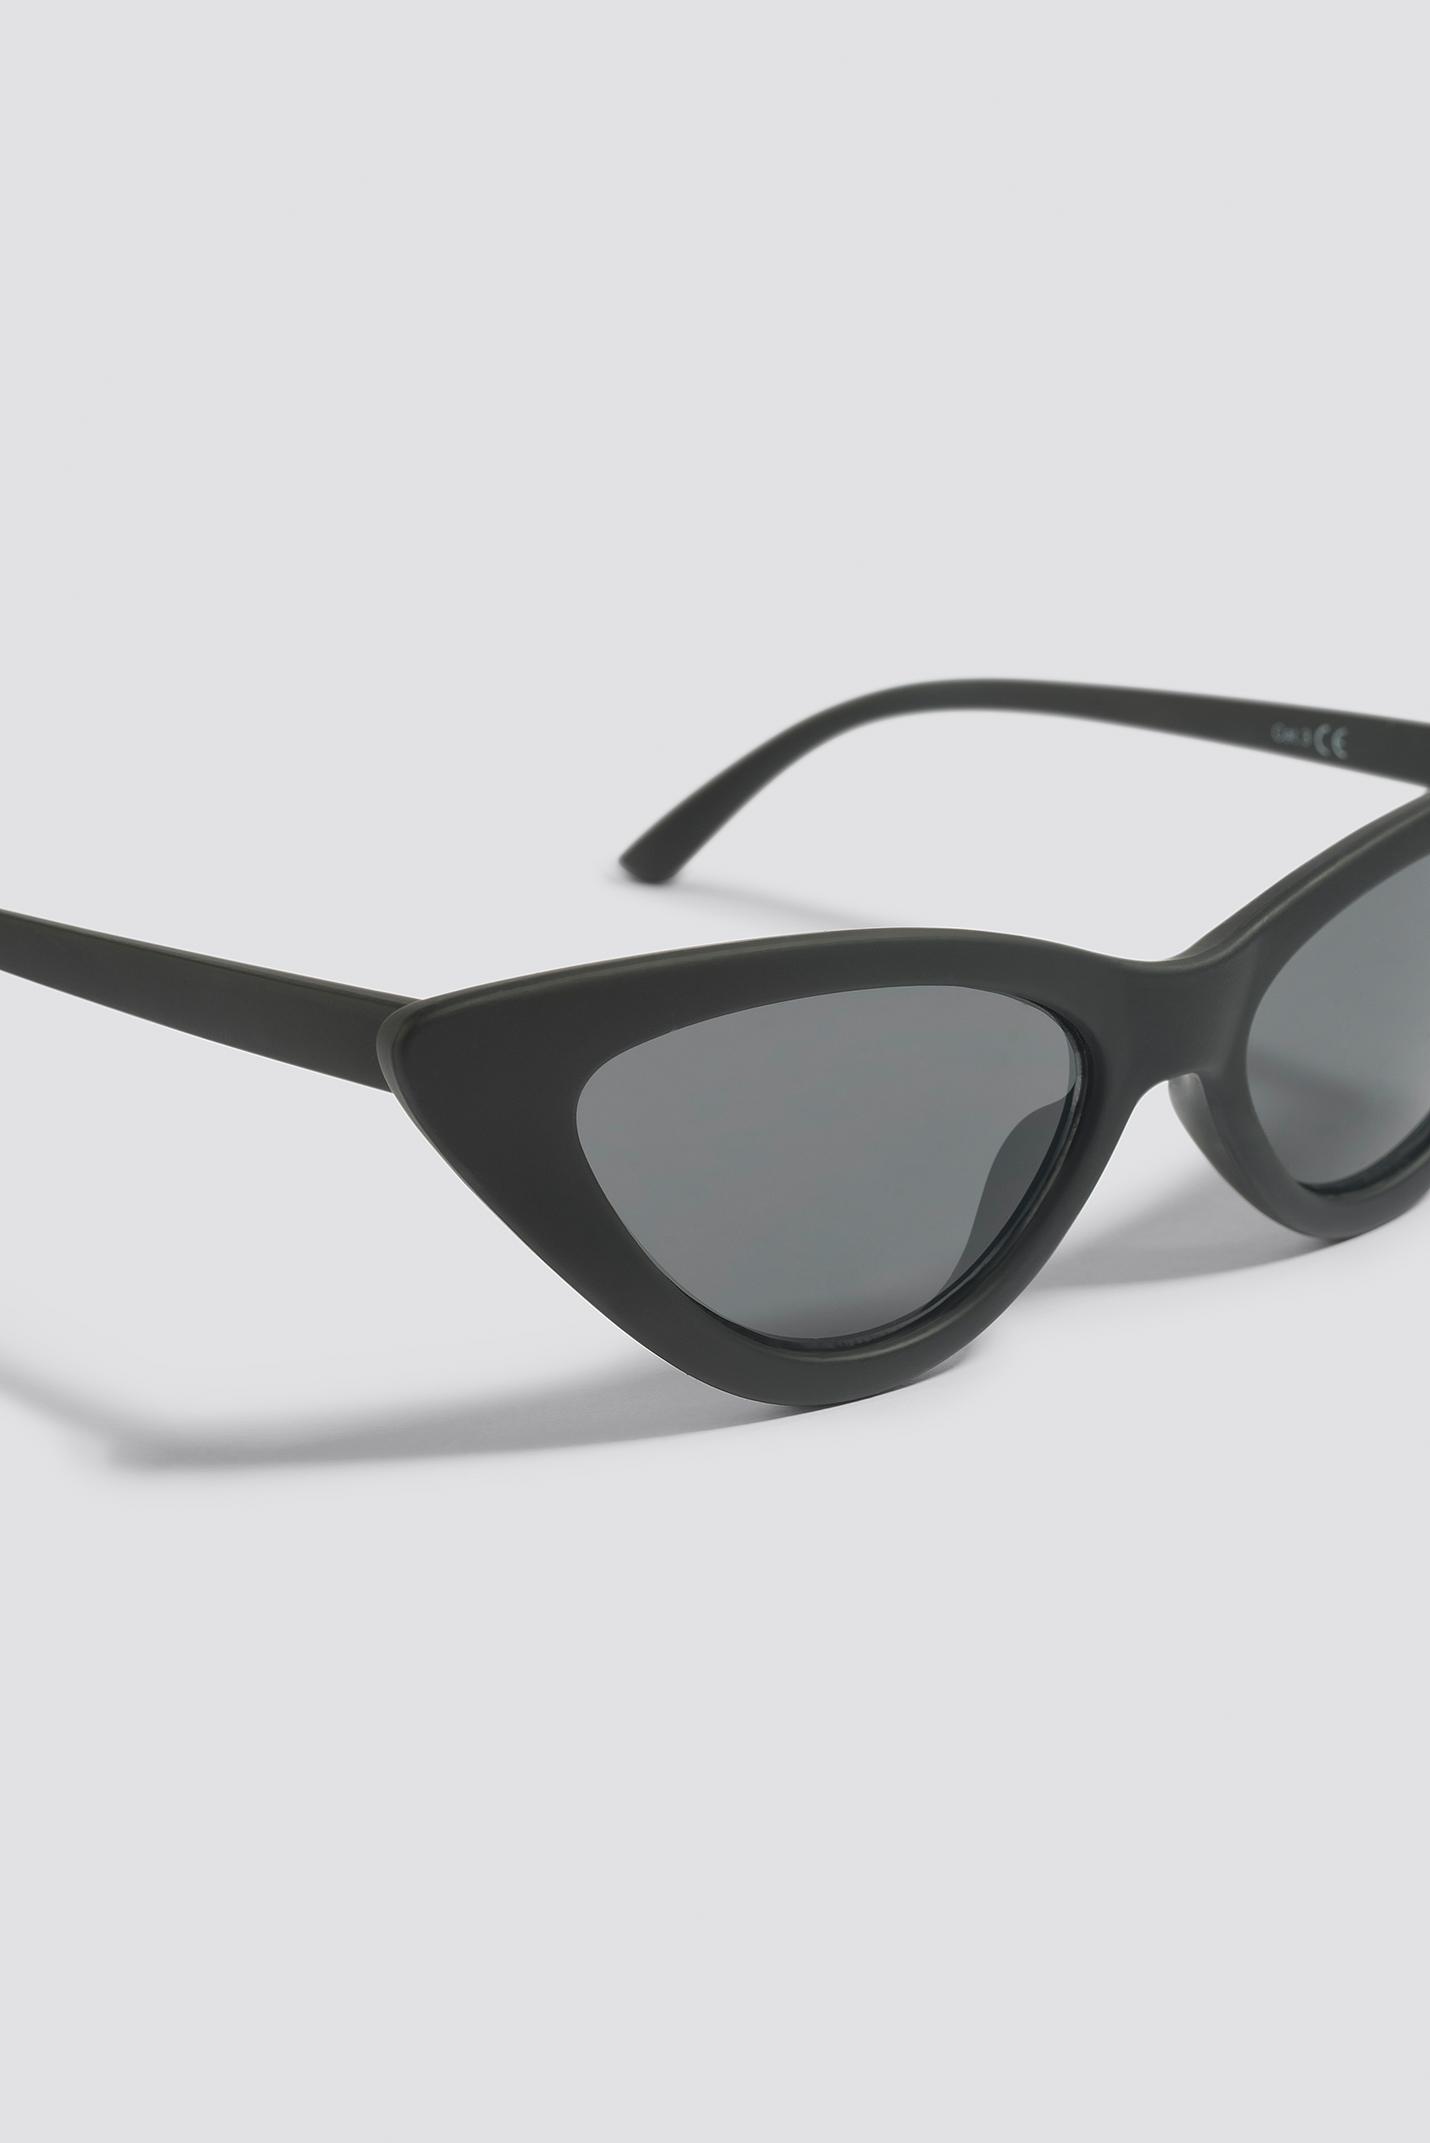 NA-KD Accessories Wide Rectangle Sunglasses - Black I8L1bNrStT